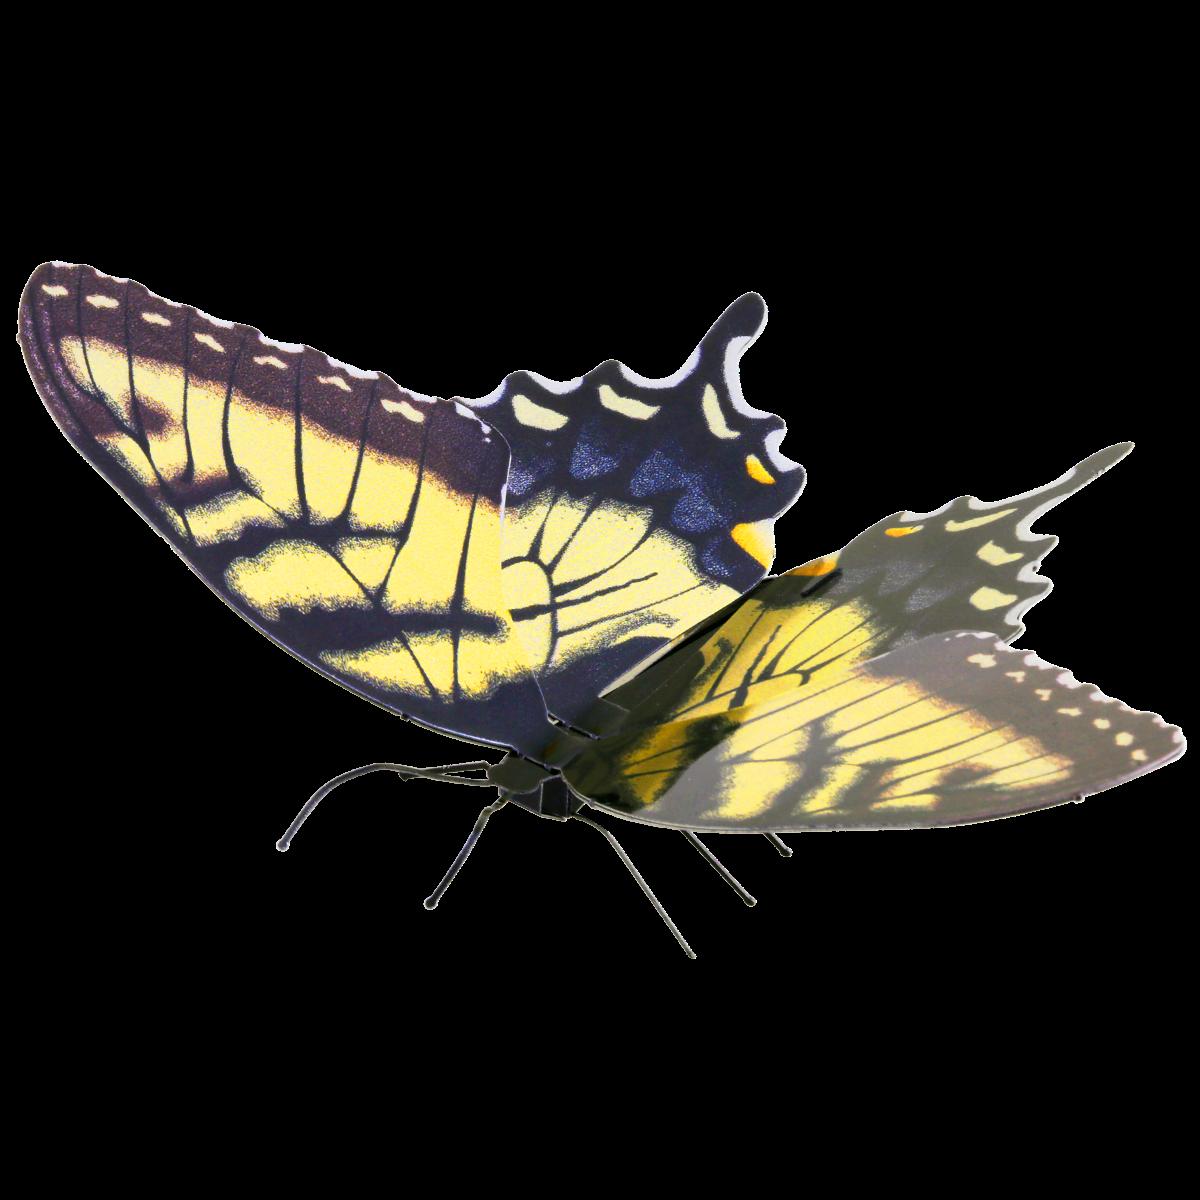 0001292_tiger-swallowtail_1200